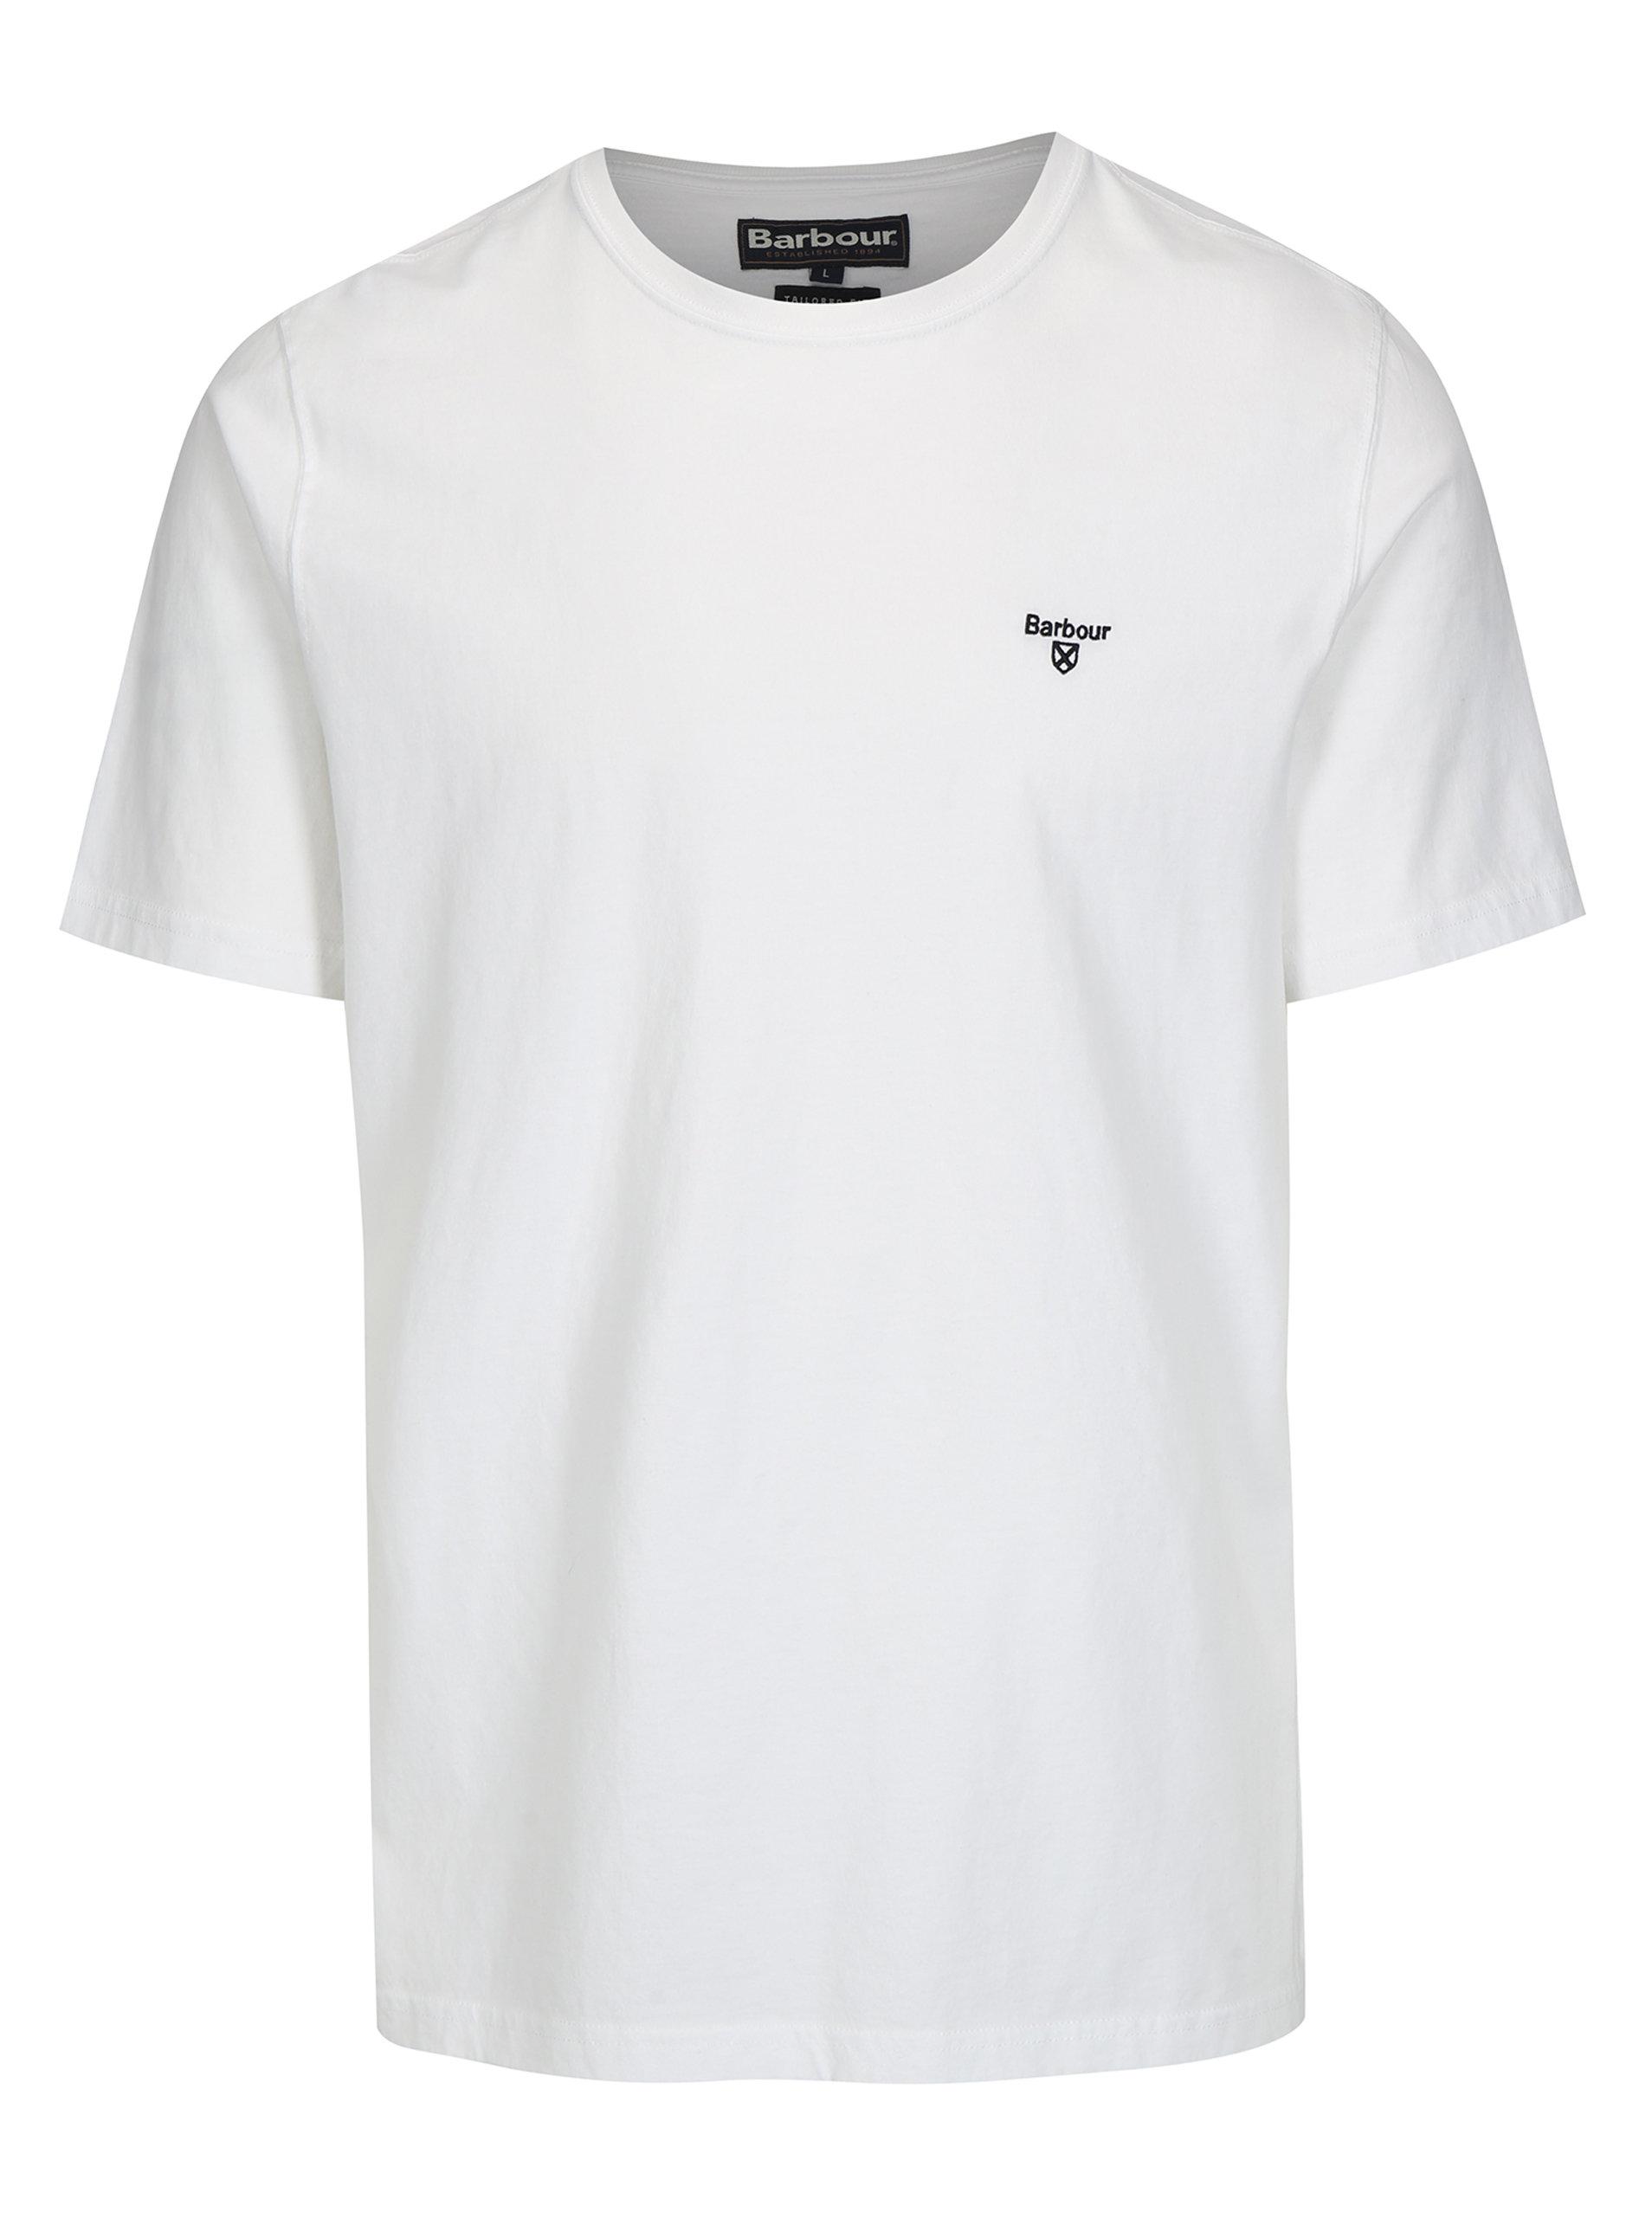 5b1bec3cce6 Bílé tailored fit basic tričko Barbour Sports Tee ...